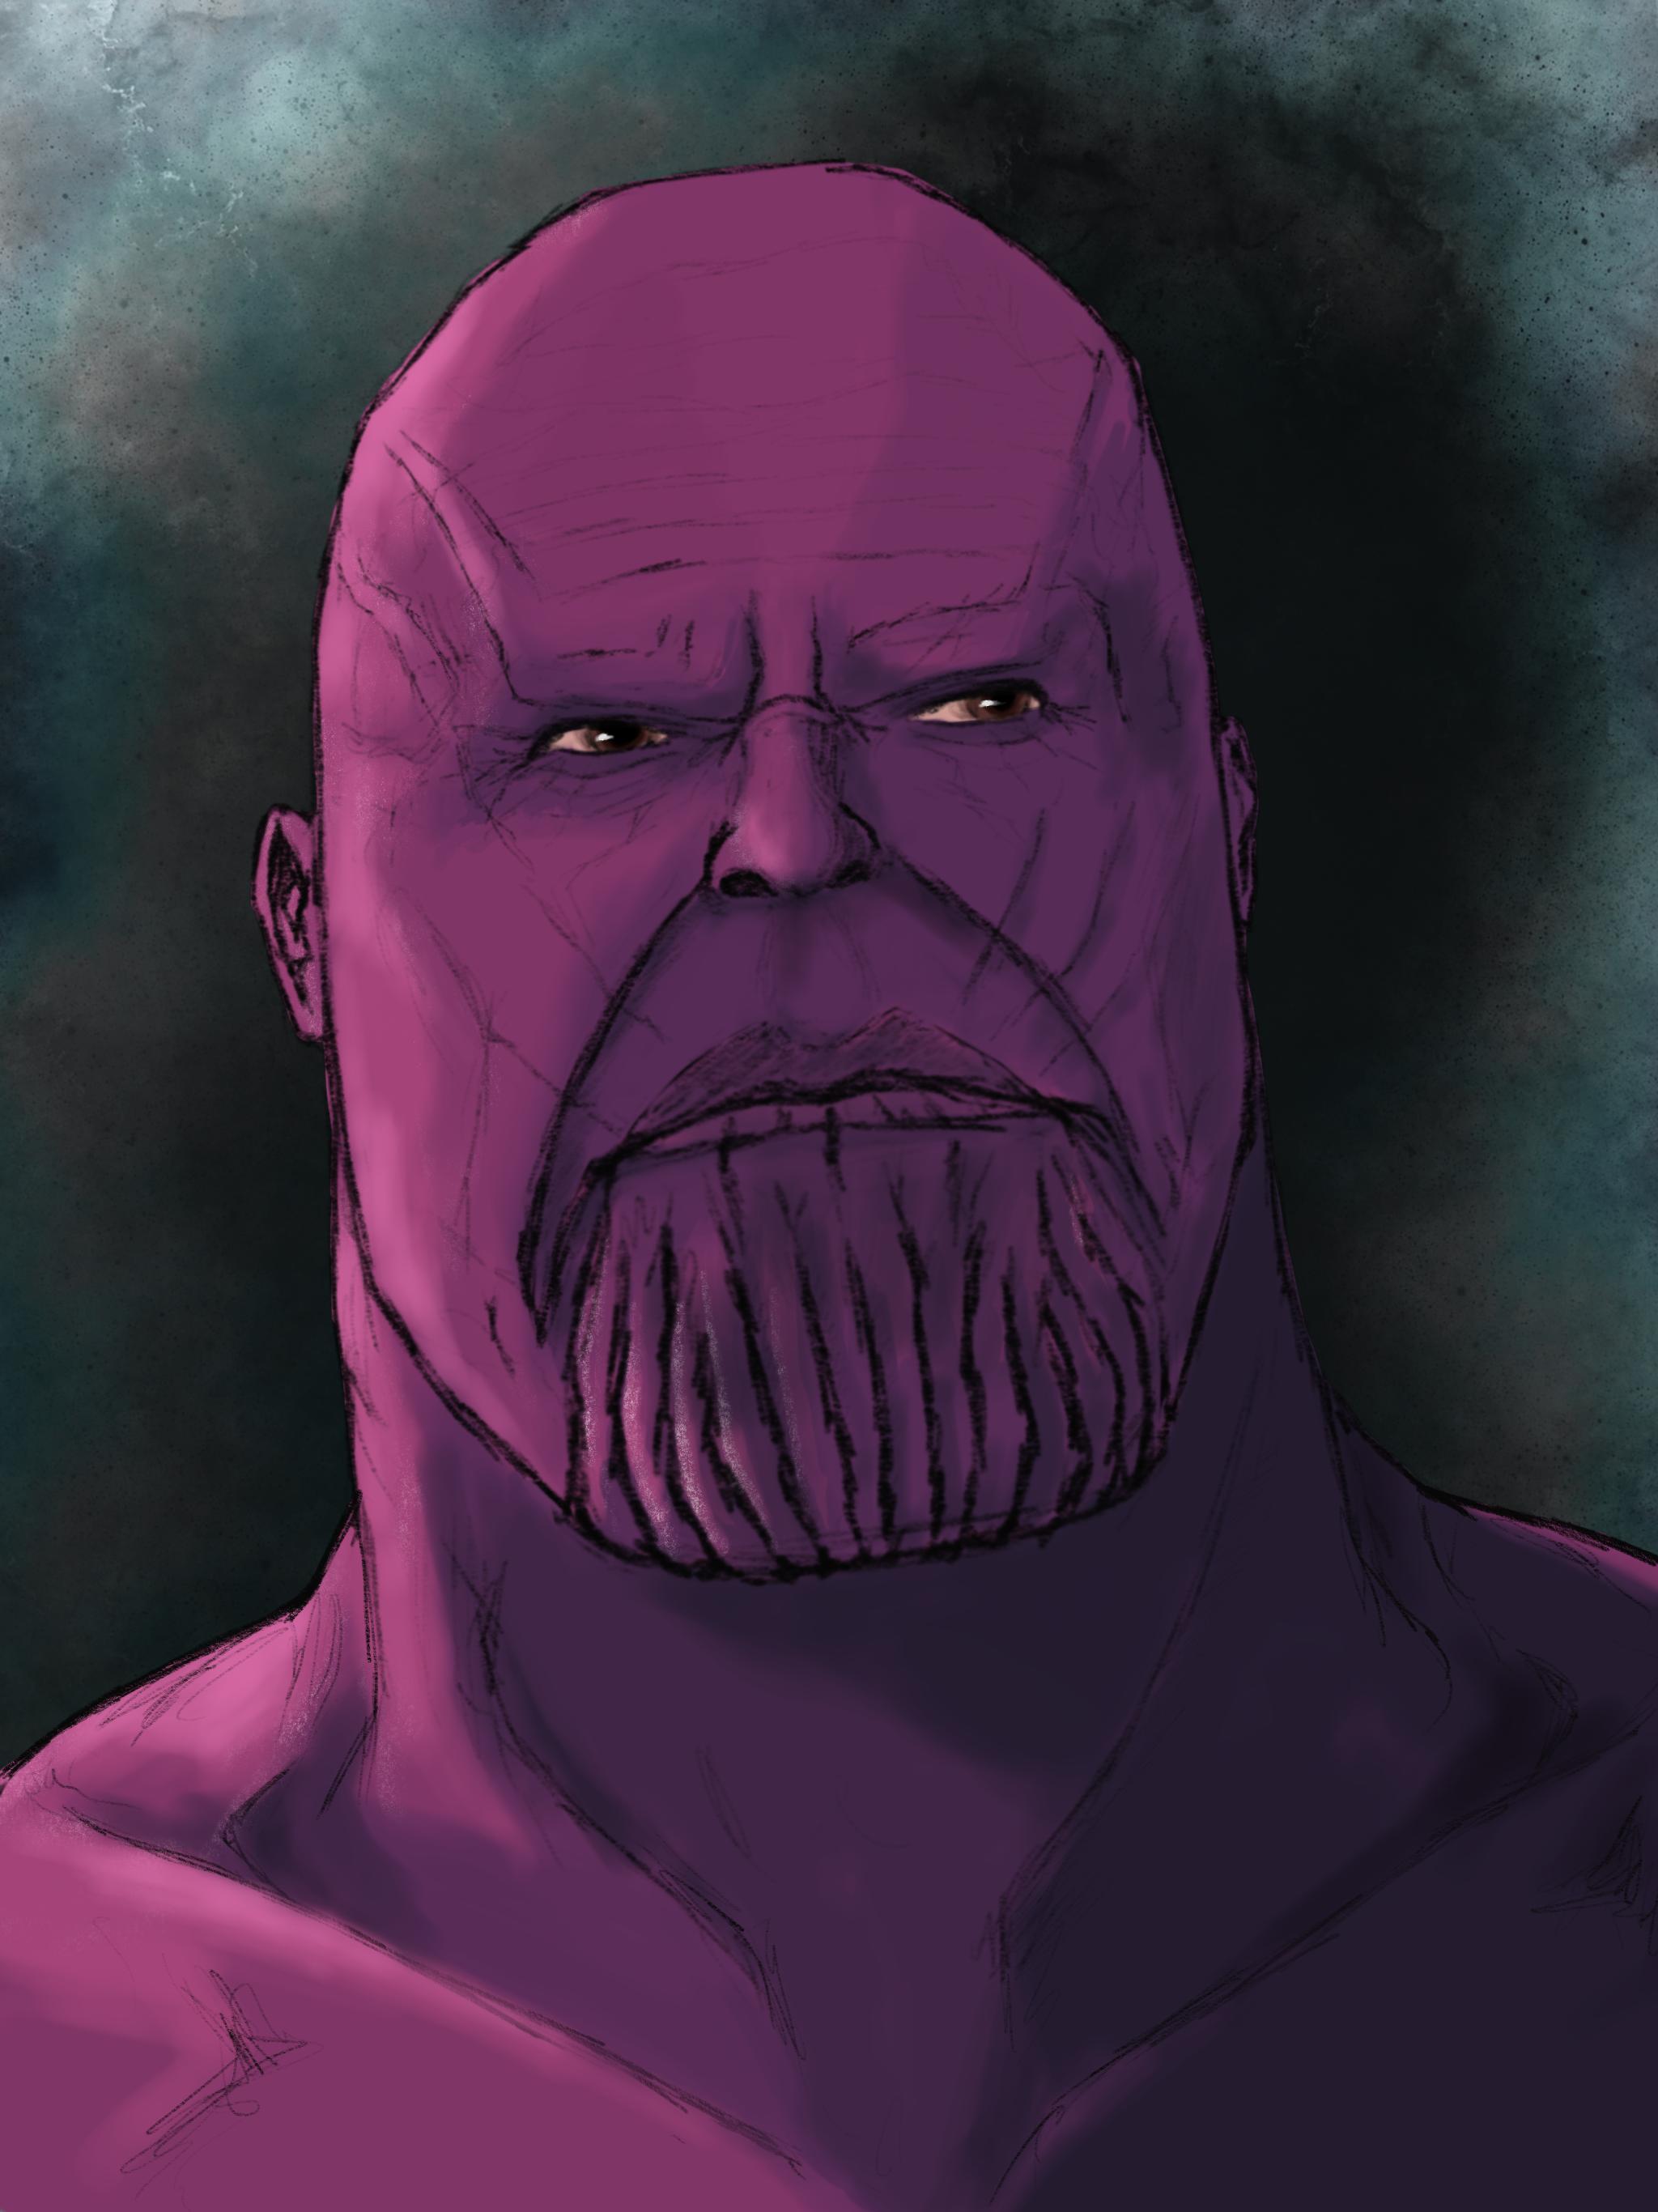 Thanos by TauDA on Newgrounds